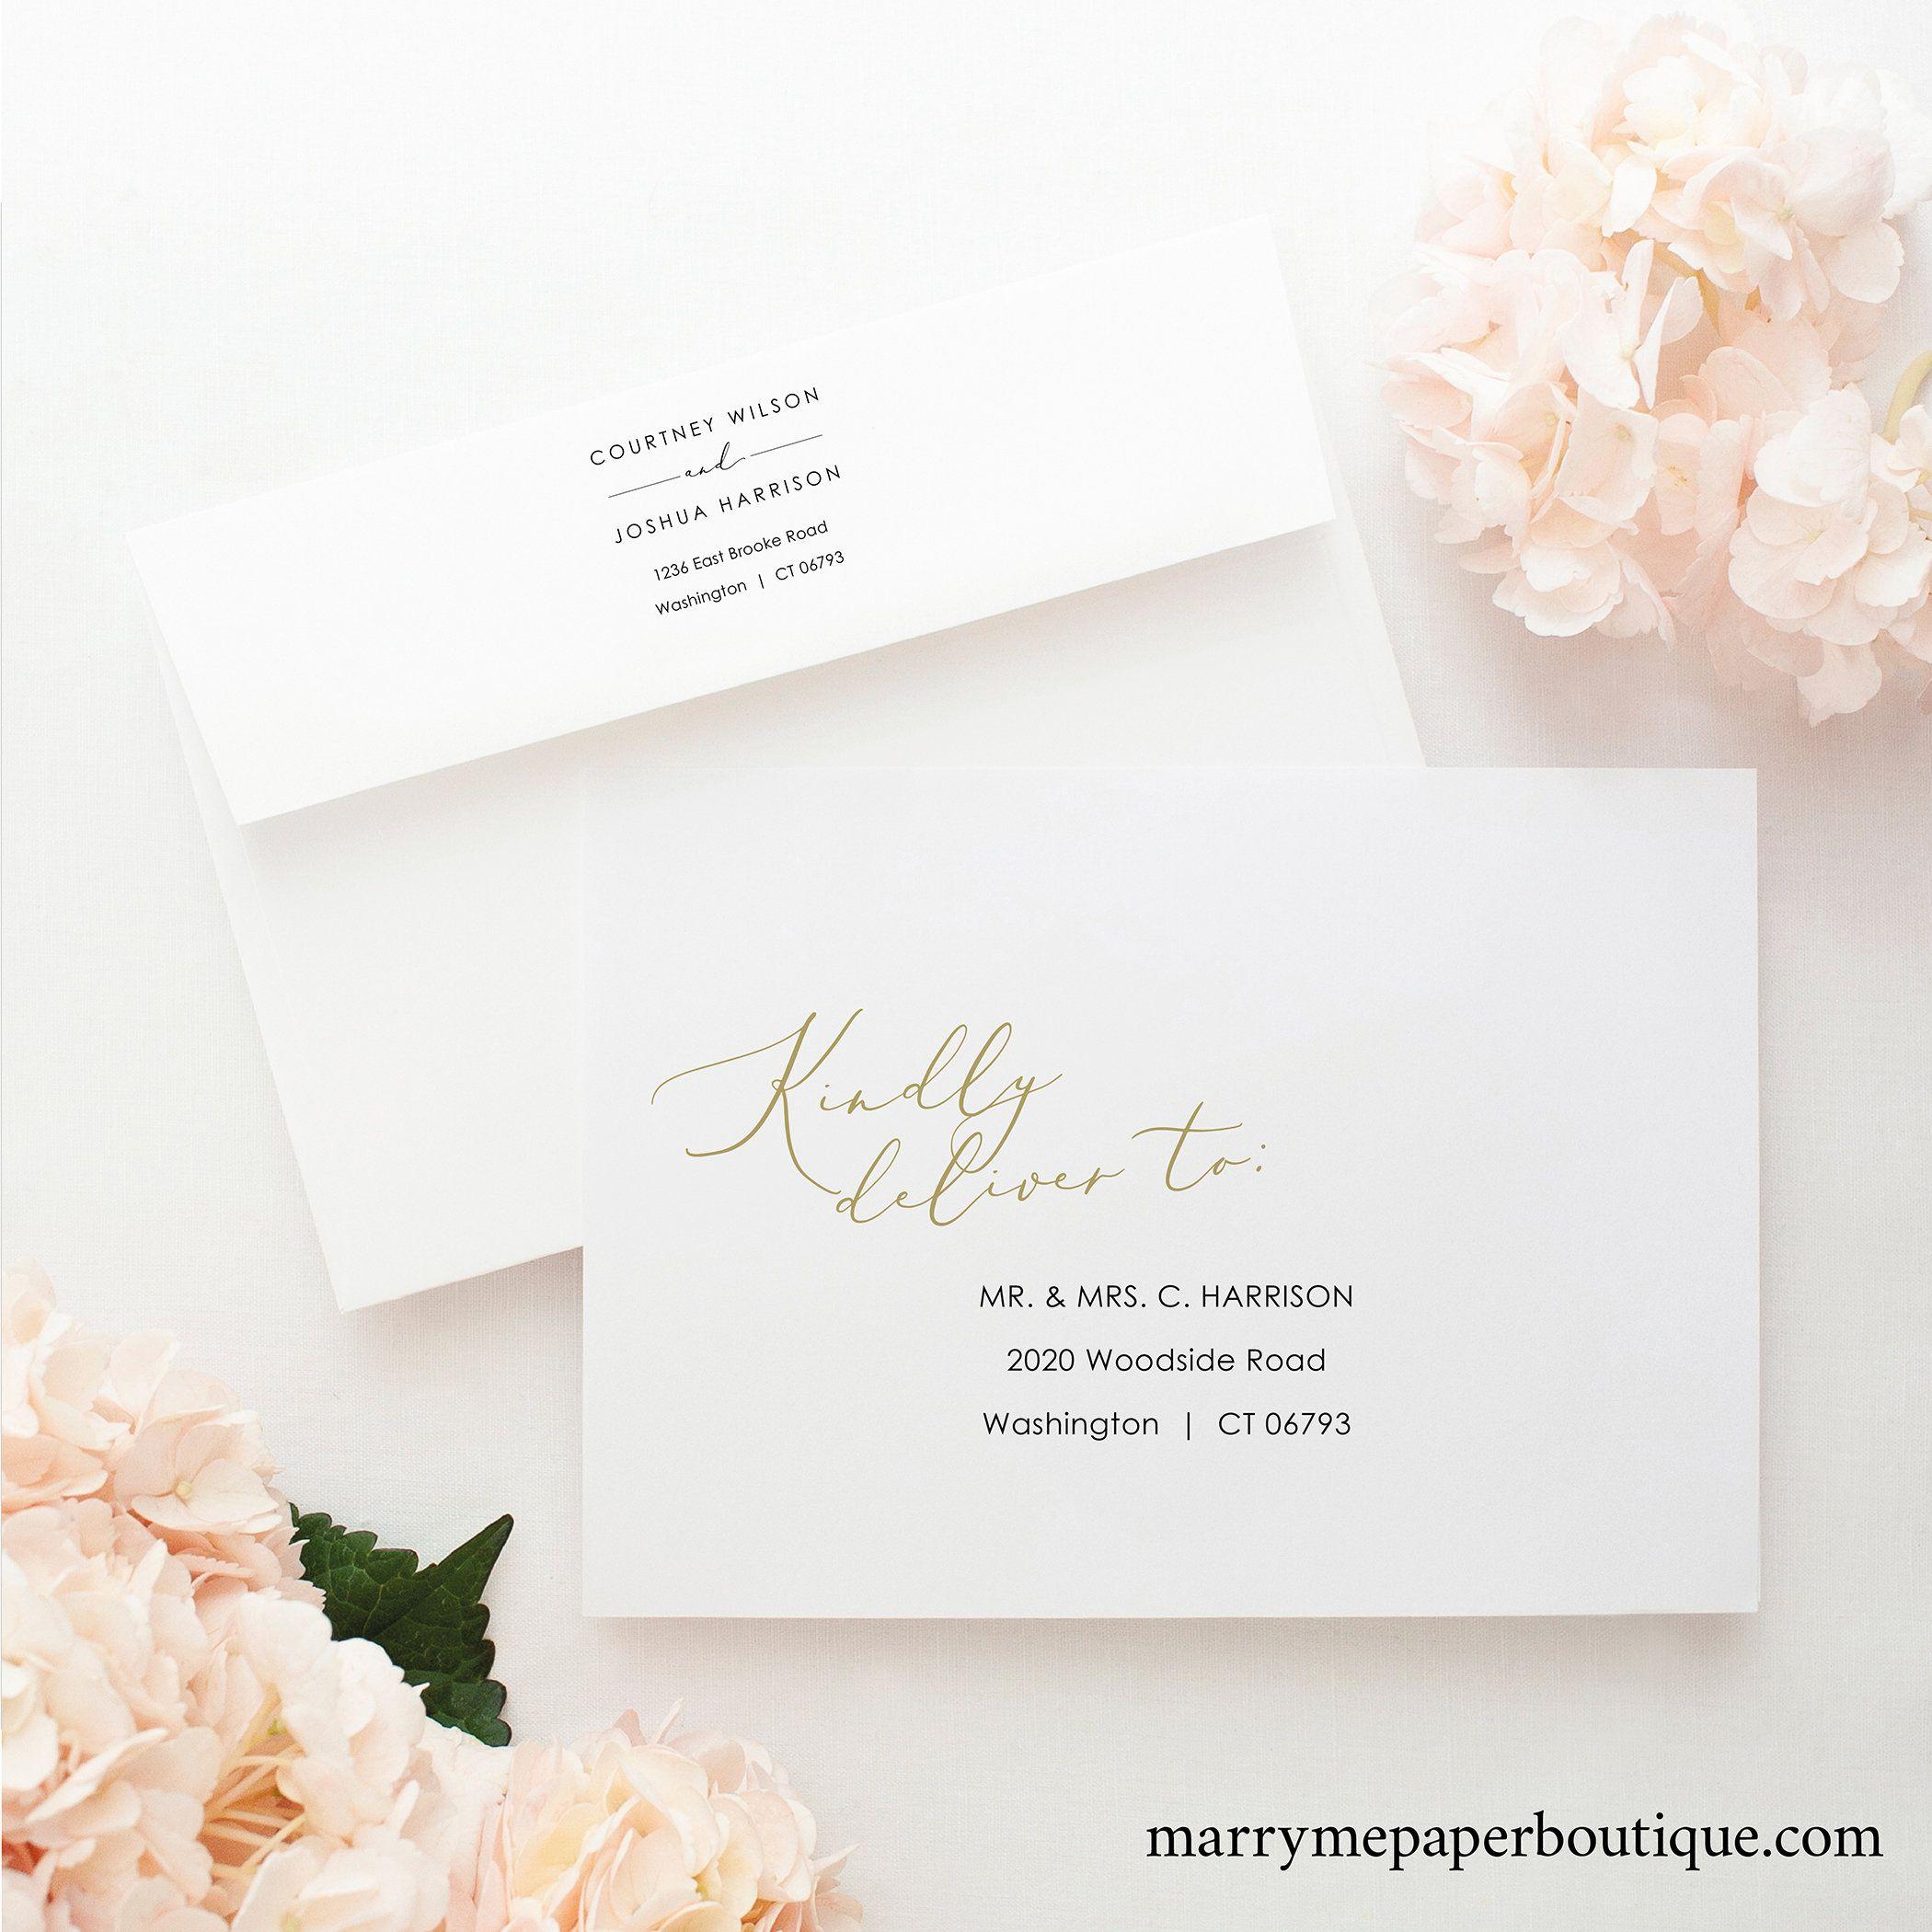 Envelope Address Template Elegant Gold Script Envelope Etsy In 2020 Envelope Addressing Template Addressing Envelopes Addressing Envelopes Wedding